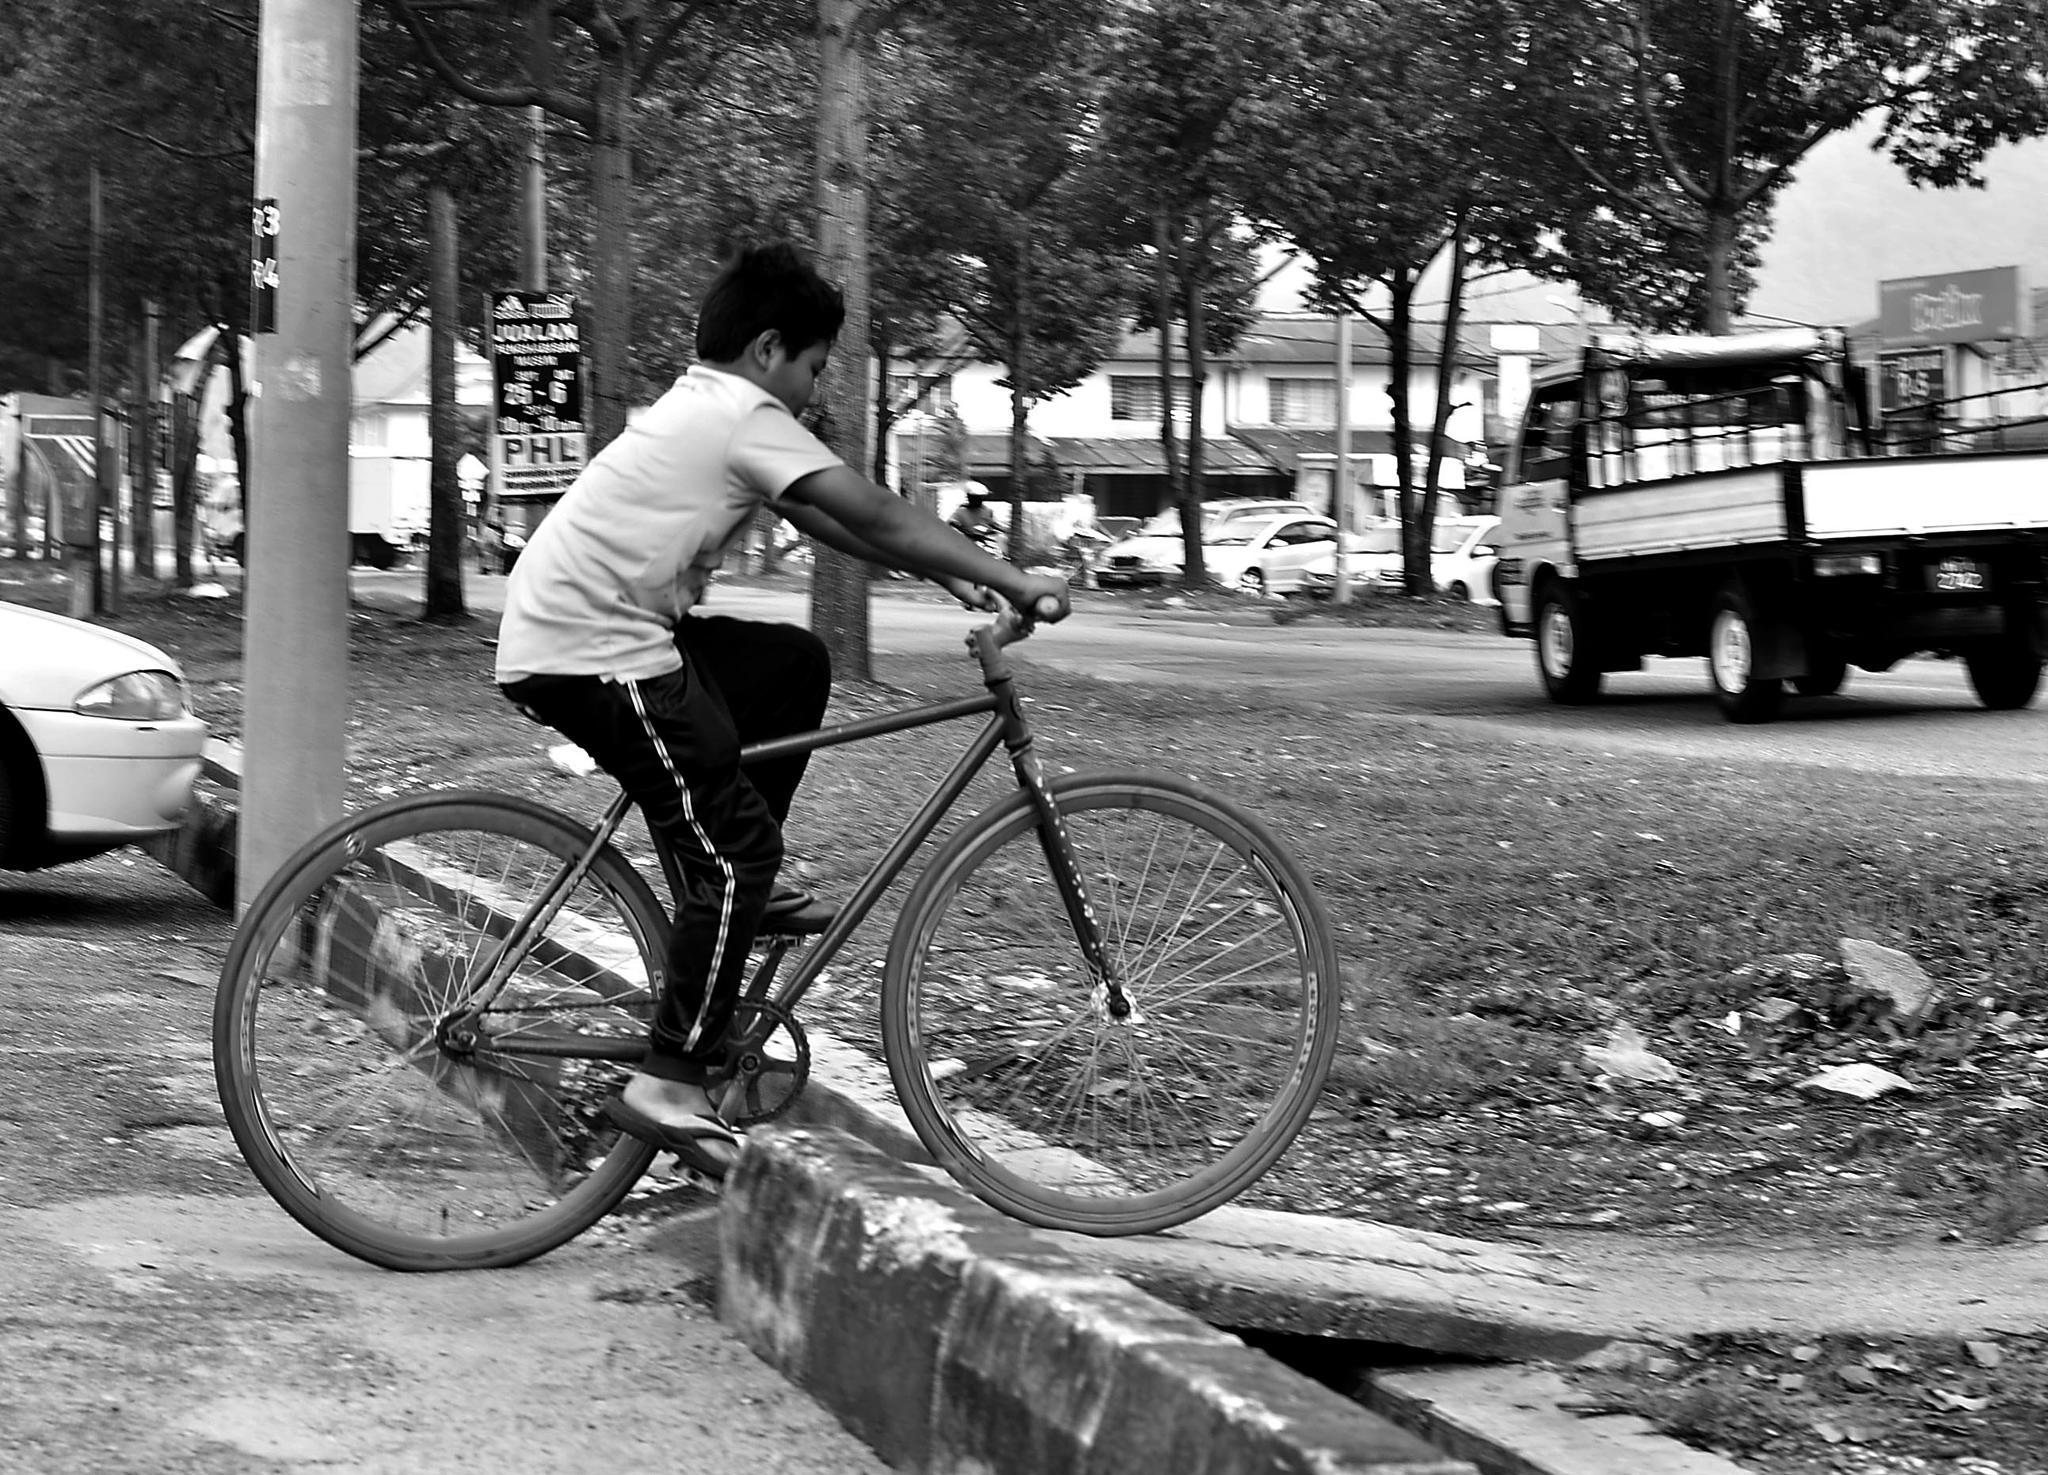 Childeran in The Urban World by Anakbentayanmuo